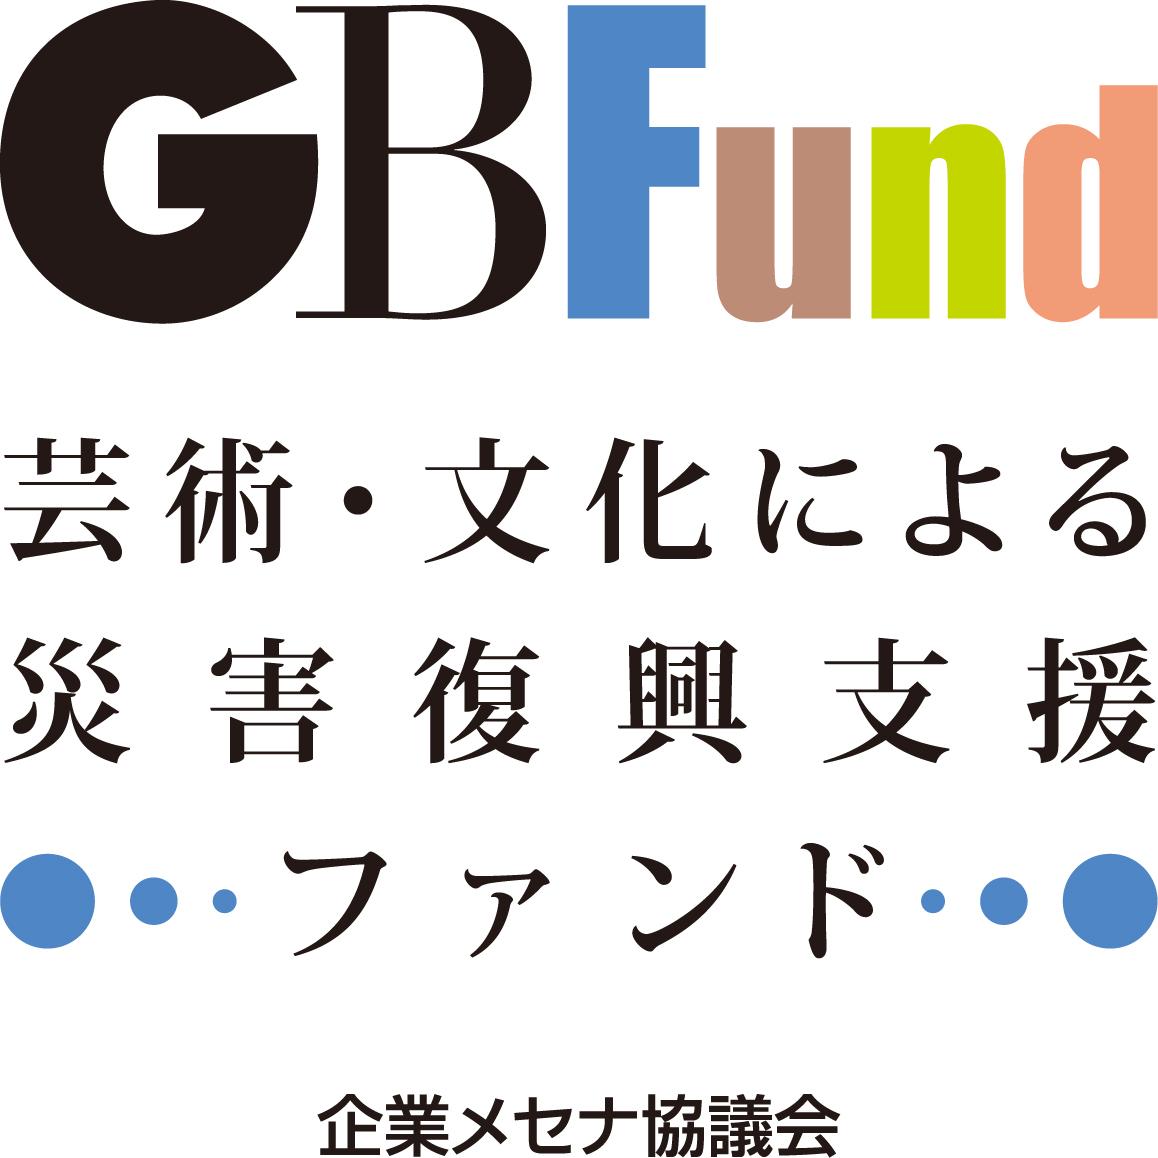 GBFund 「新型コロナウイルス感染拡大による芸術文化活動の継続・発展への支援」 活動募集を終了しました。